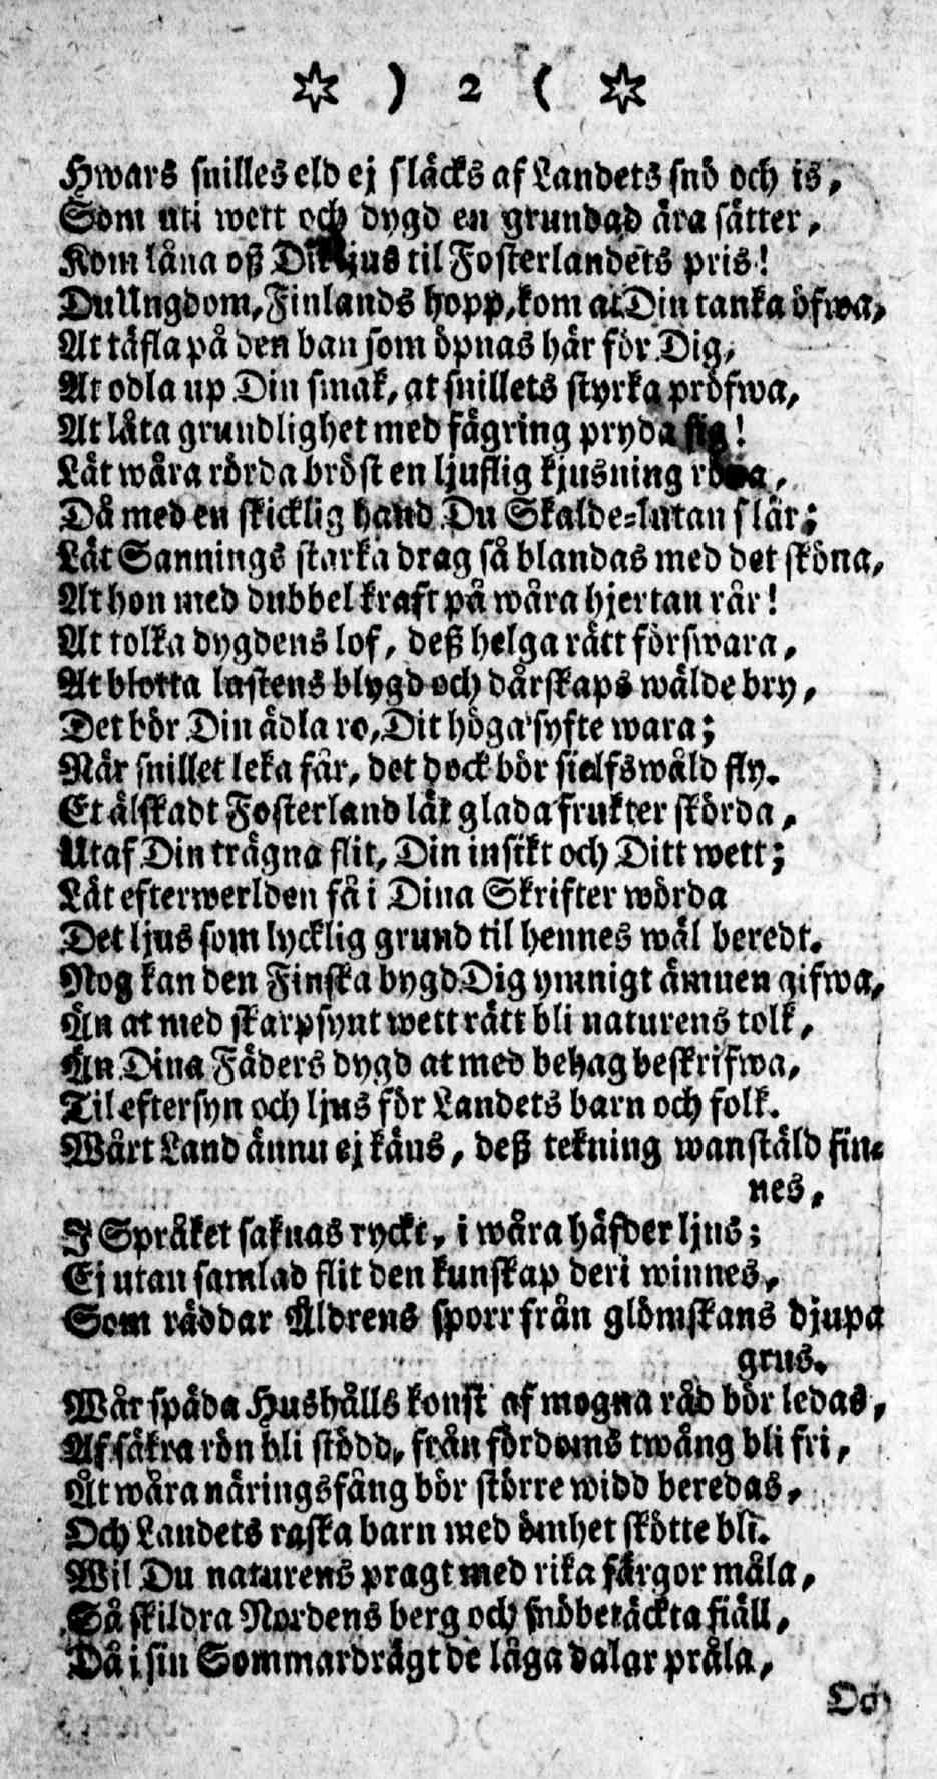 Tidningar Utgifne af et Sällskap i Åbo, 15.01.1771, nro 1, sivu 2